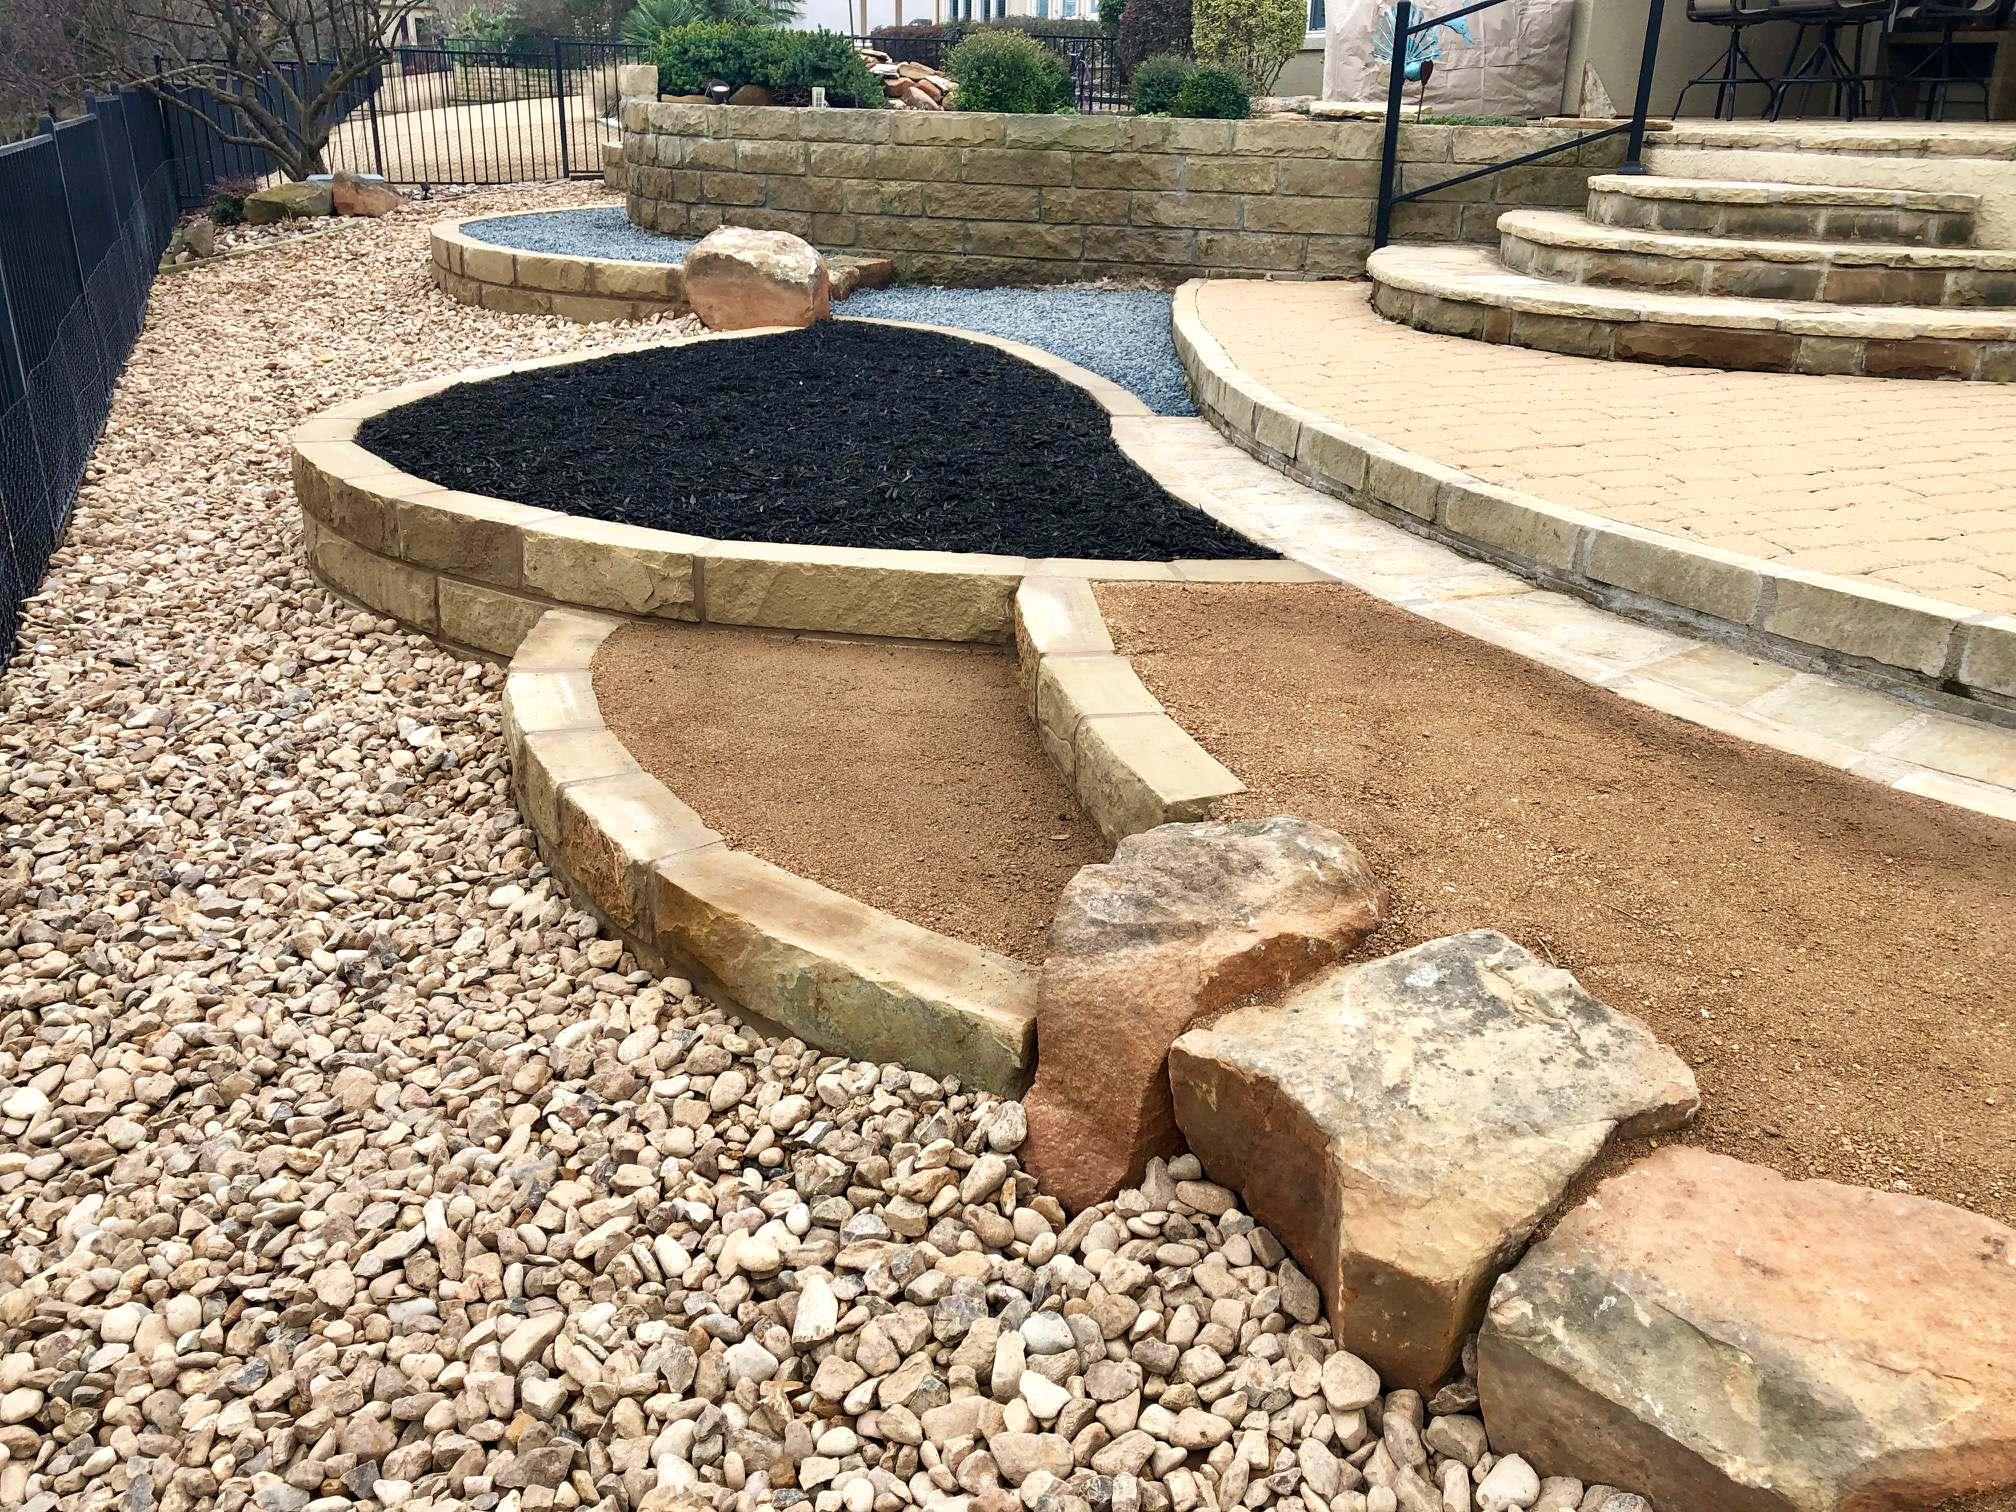 Stone walls & Pathways (Basalt & Decomposed Granite)